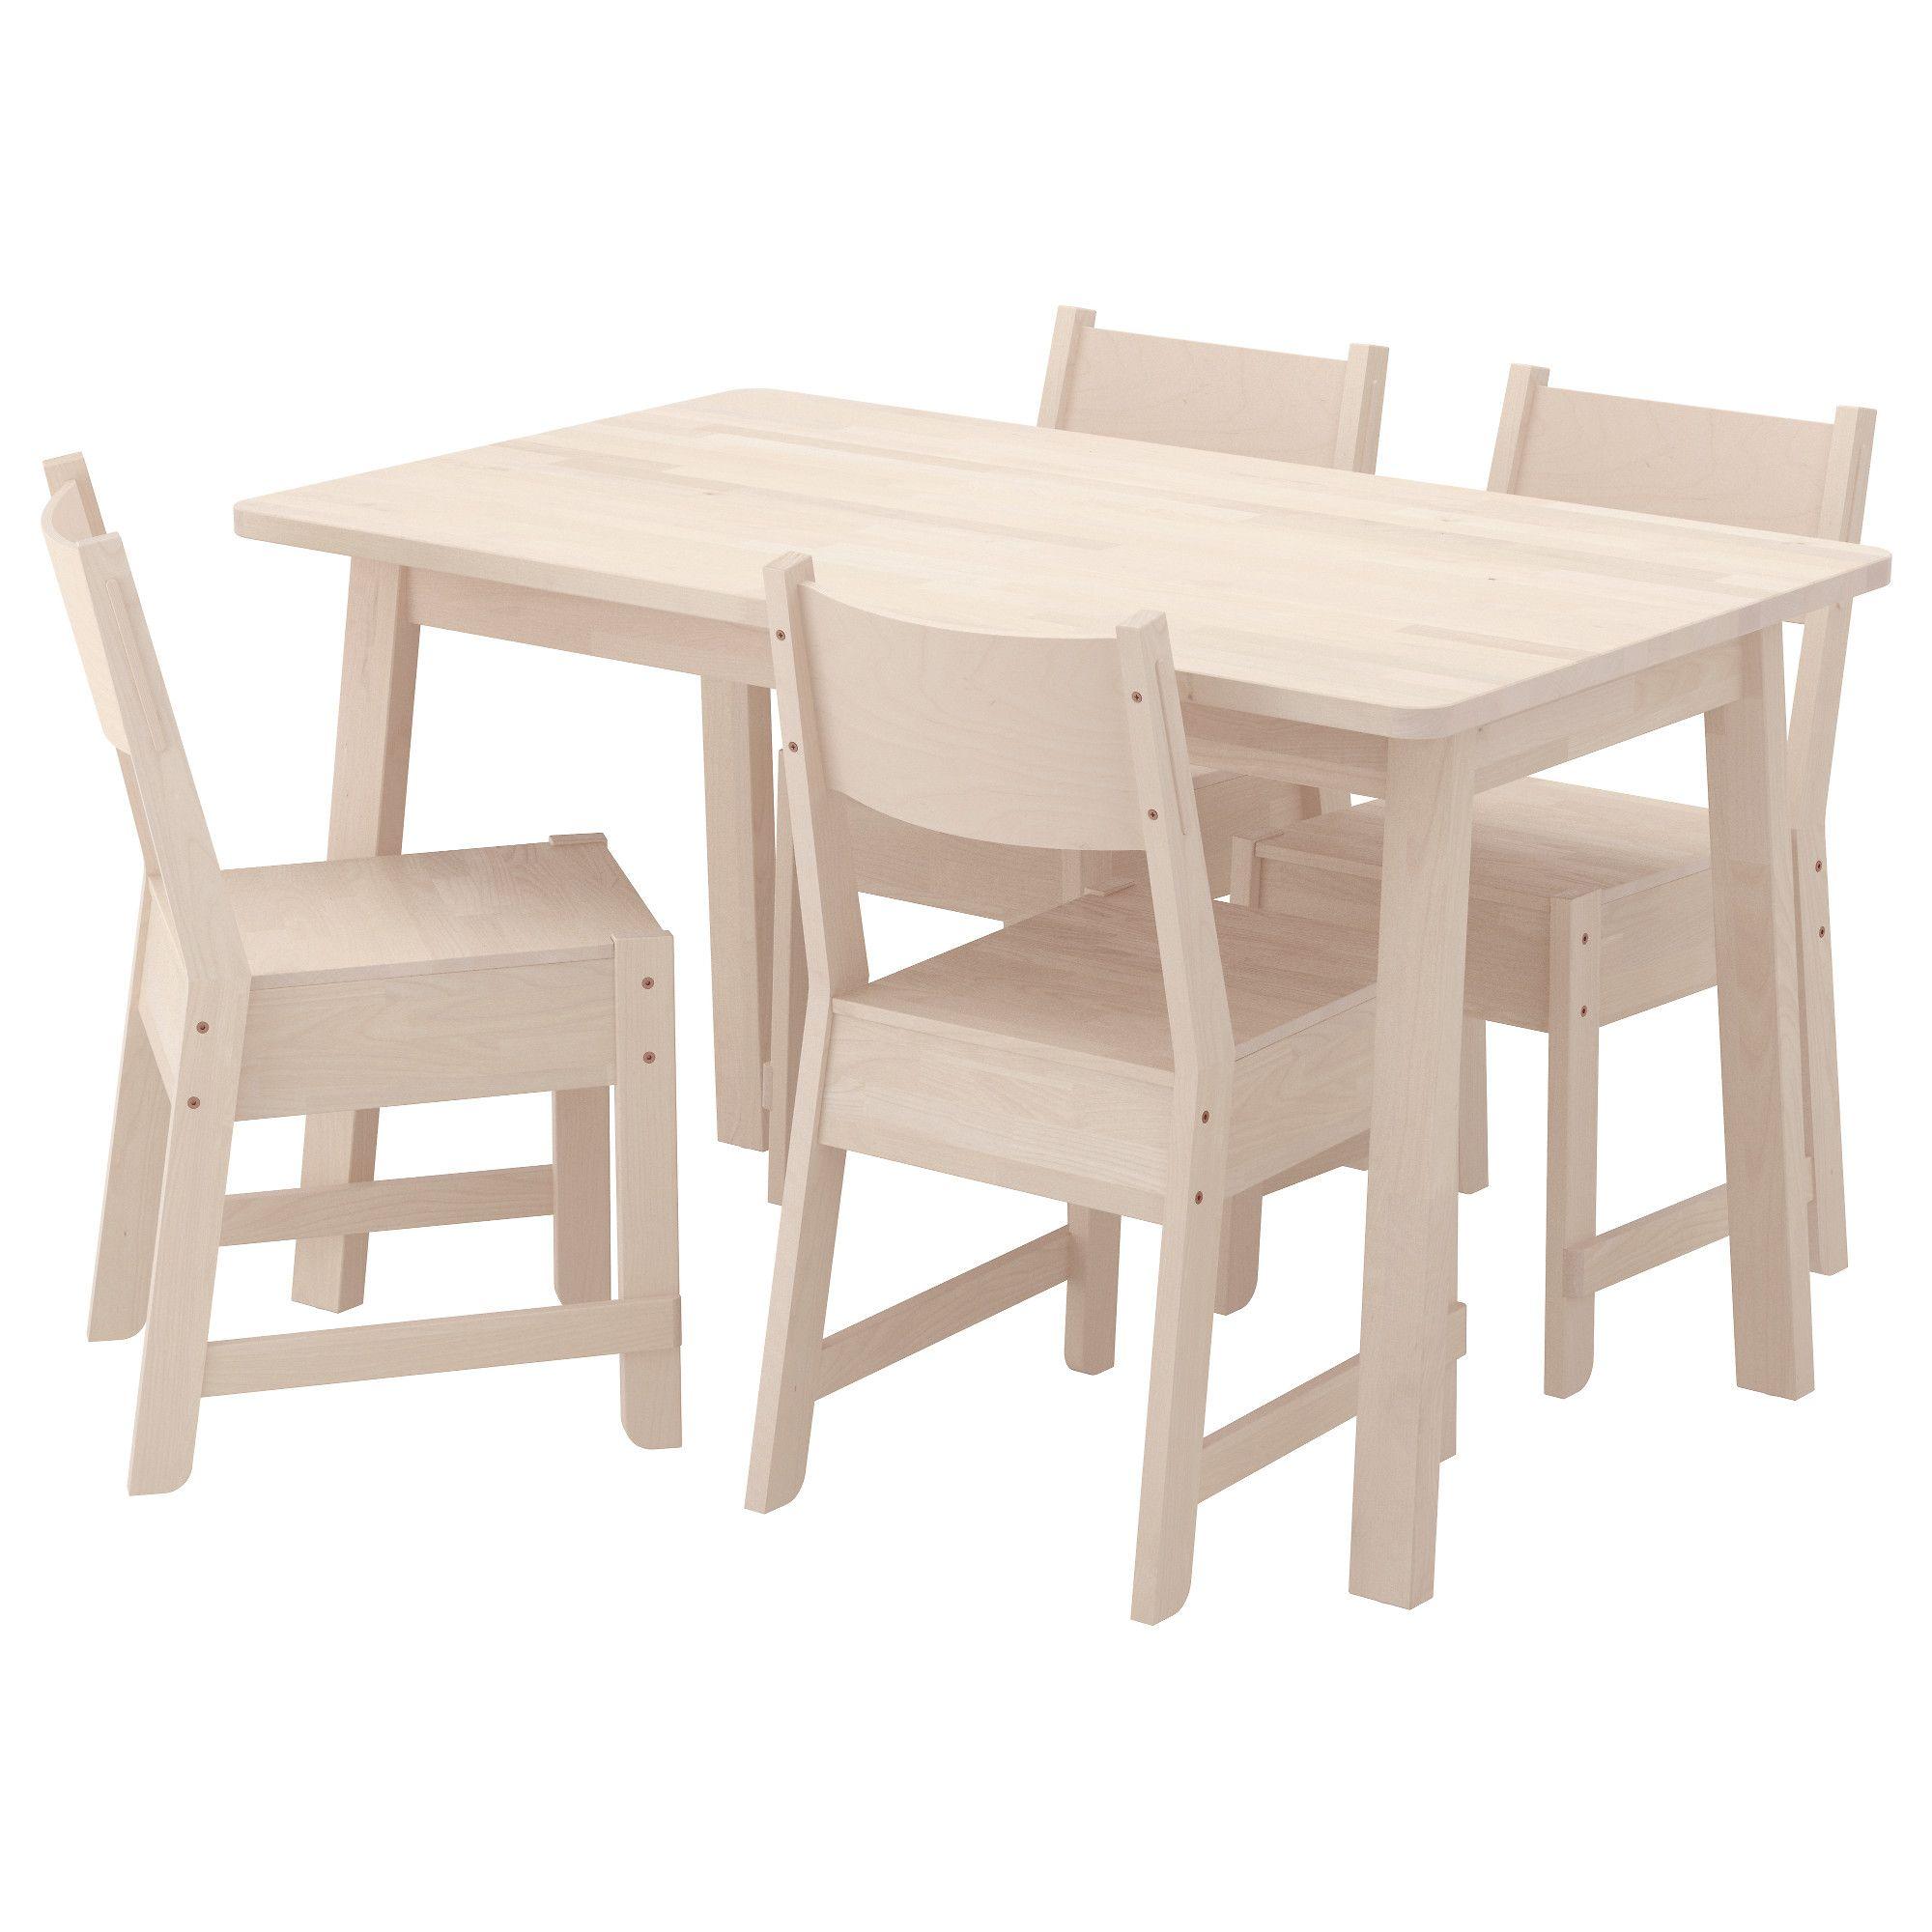 09890dbdf20d7e672baf6fd88add5bda Luxe De Pied De Table Basse Ikea Schème